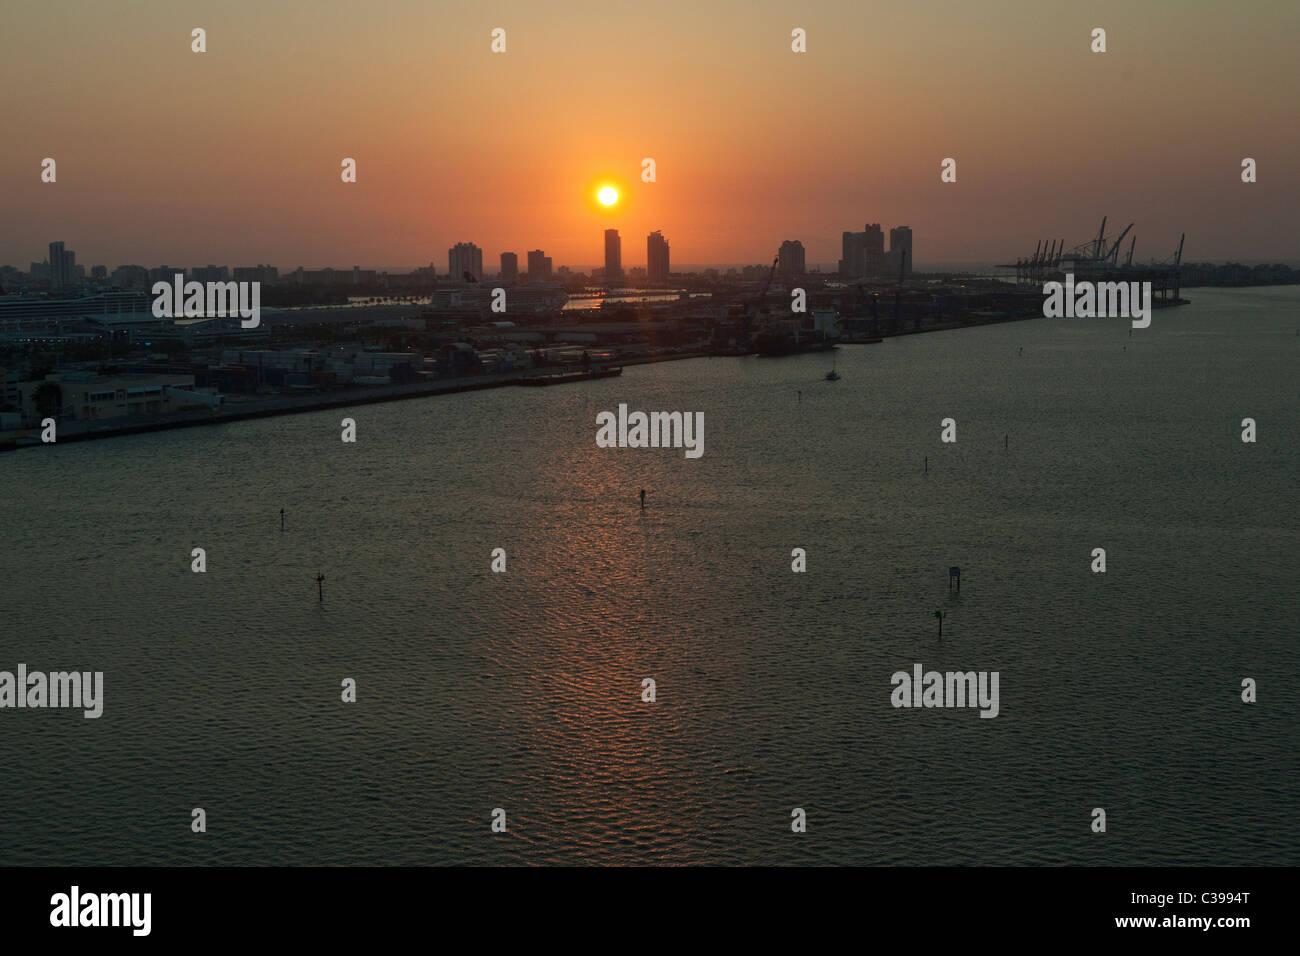 Sunrise in Miami Beach, seen from Downtown Miami. Stock Photo